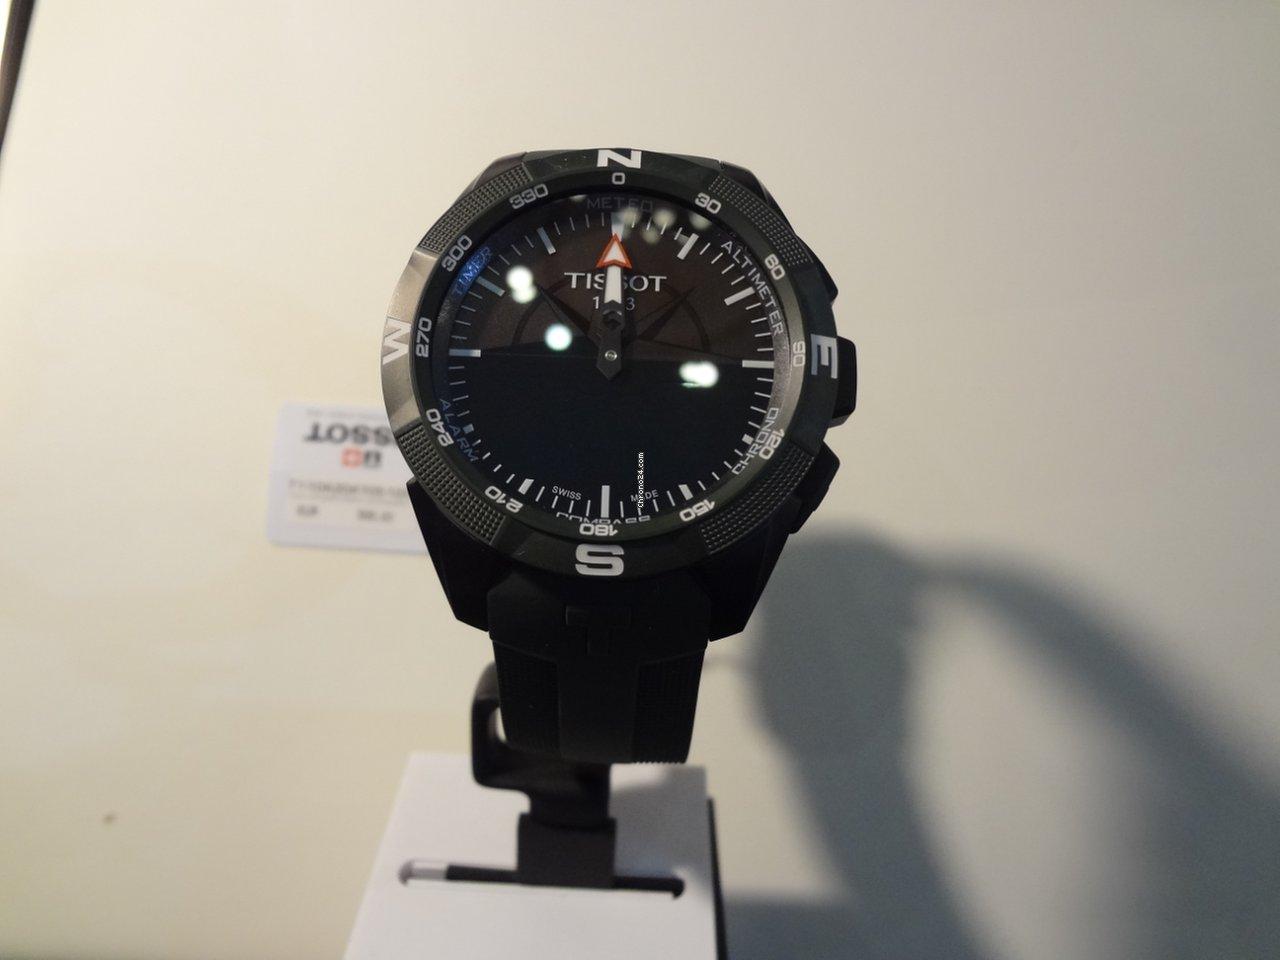 c878acb52395 Relojes Tissot Titanio - Precios de todos los relojes Tissot Titanio en  Chrono24